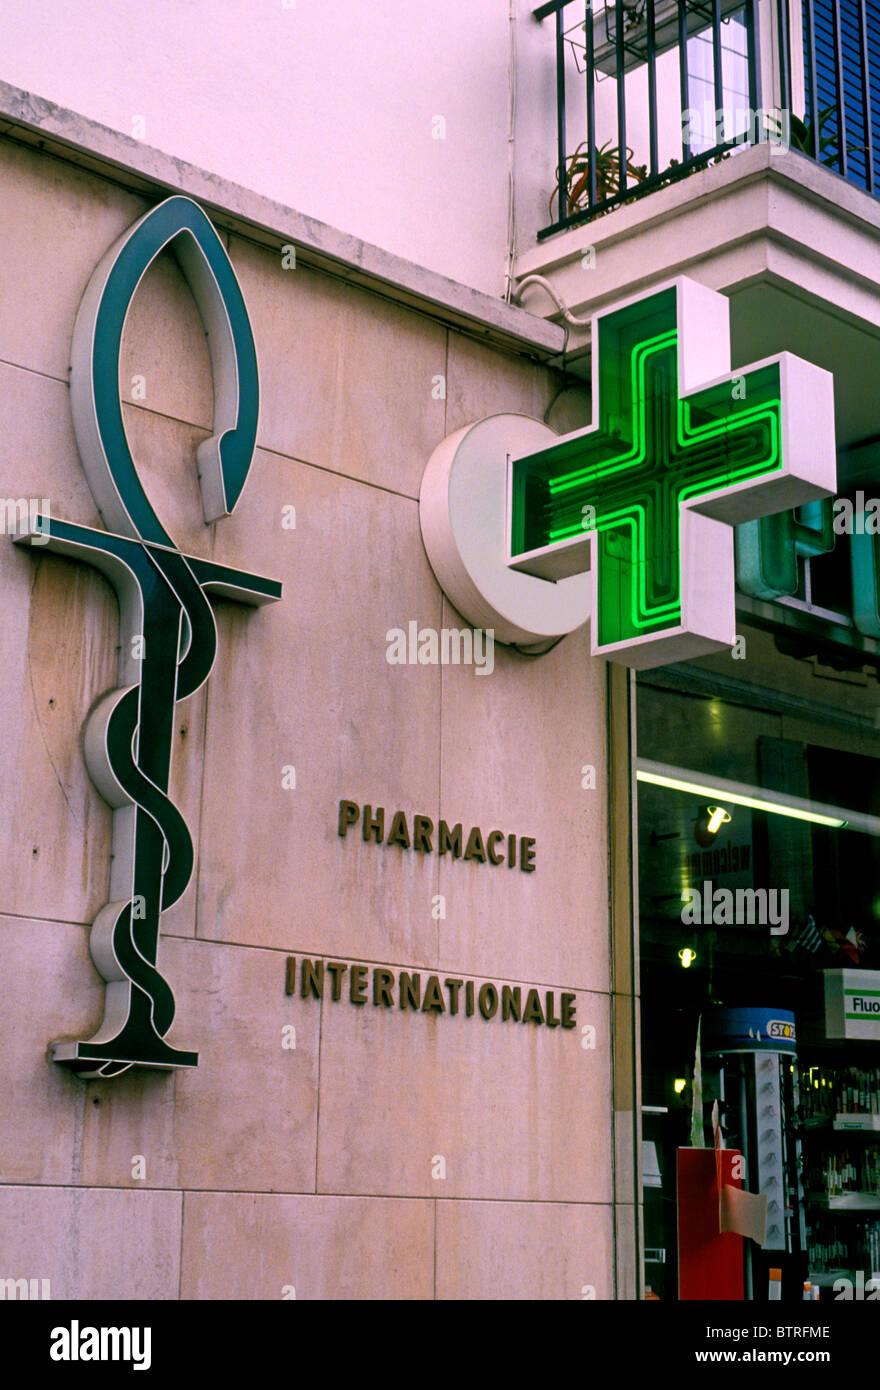 Pharmacie internet france